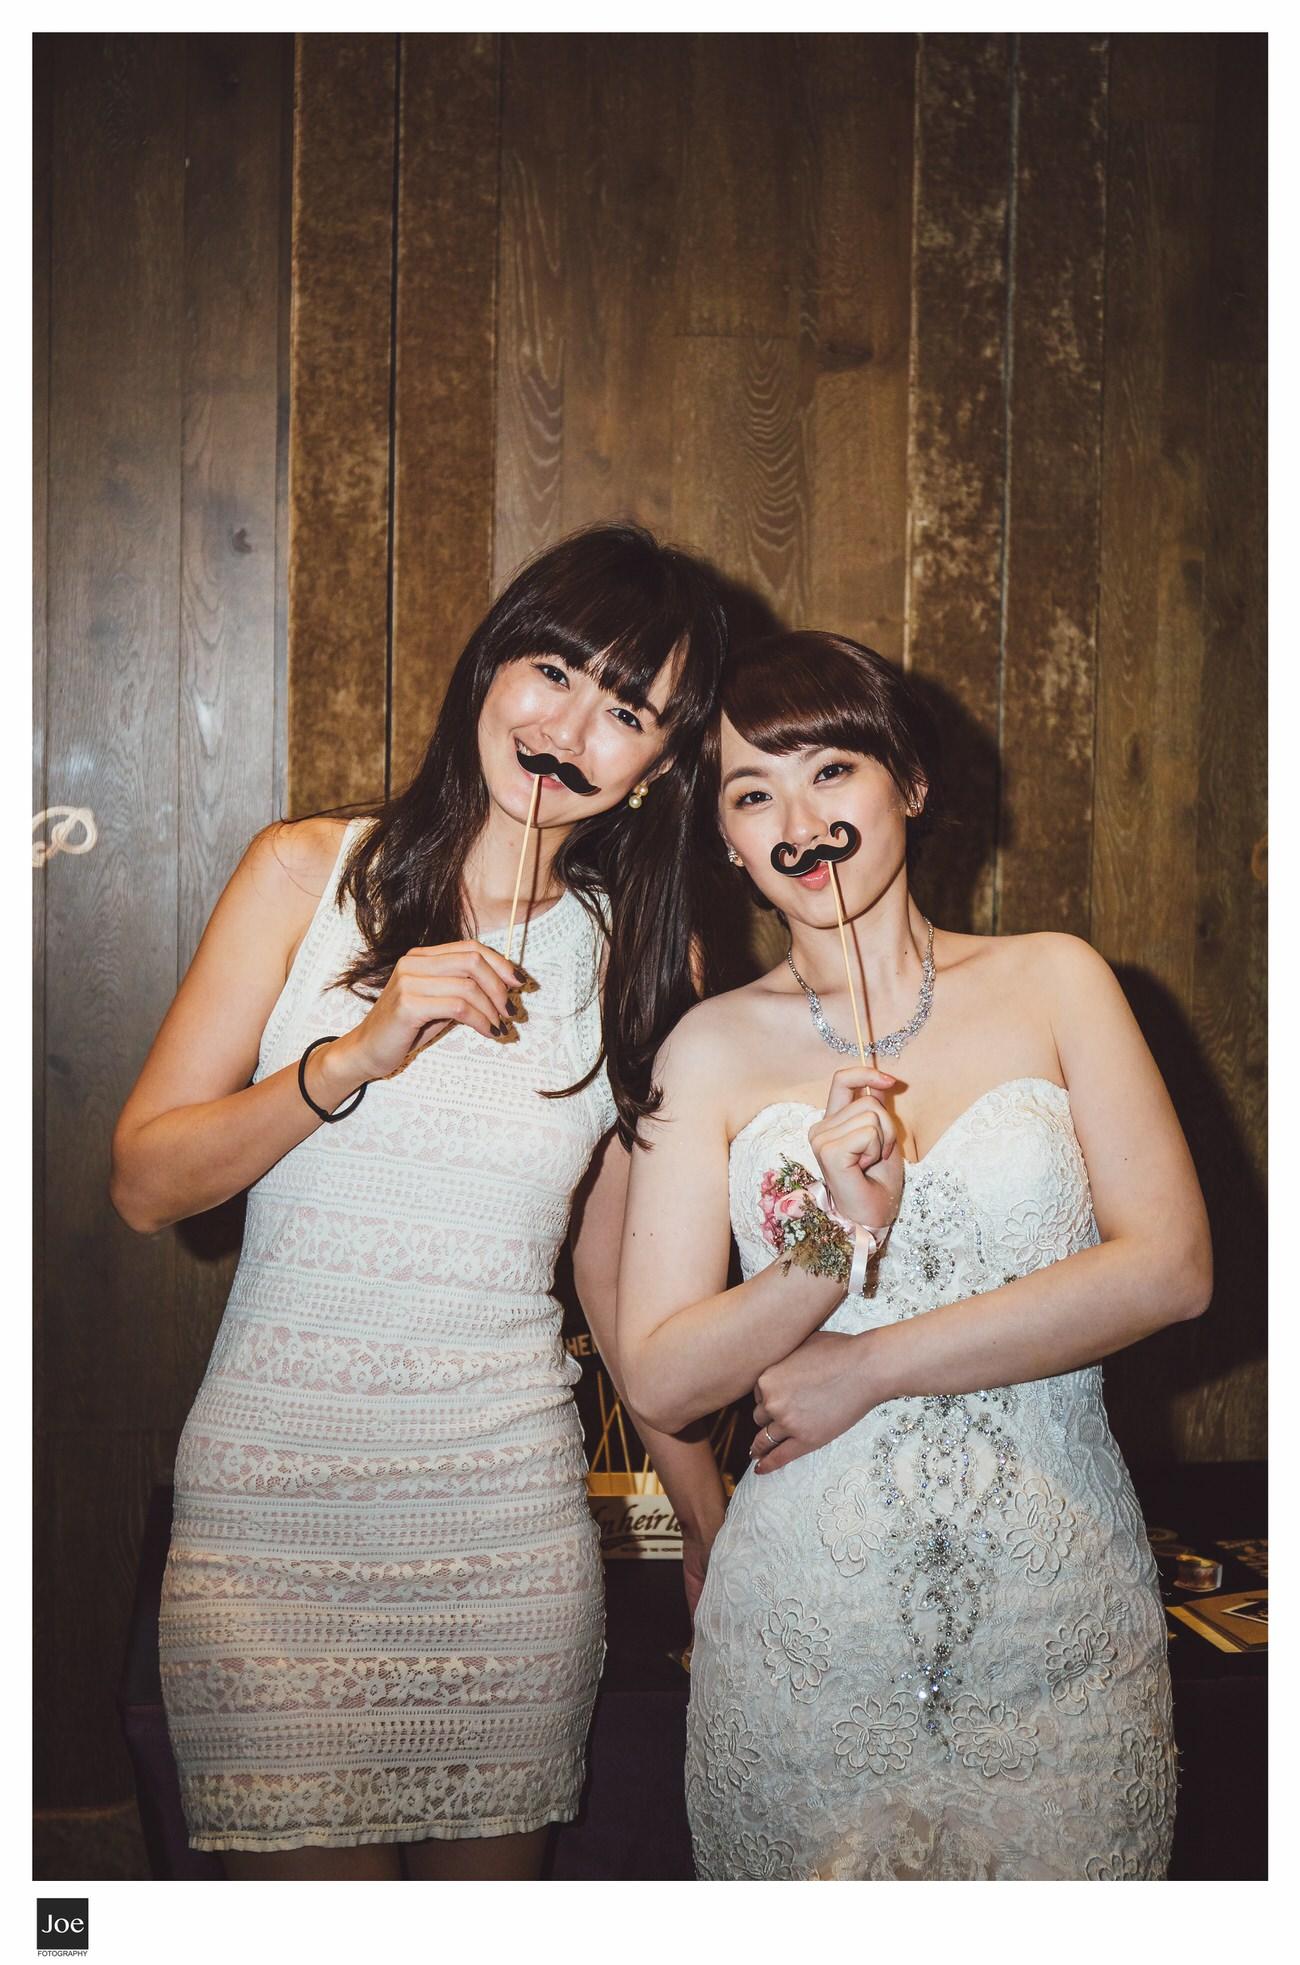 joe-fotography-wedding-photo-palais-de-chine-hotel-043.jpg